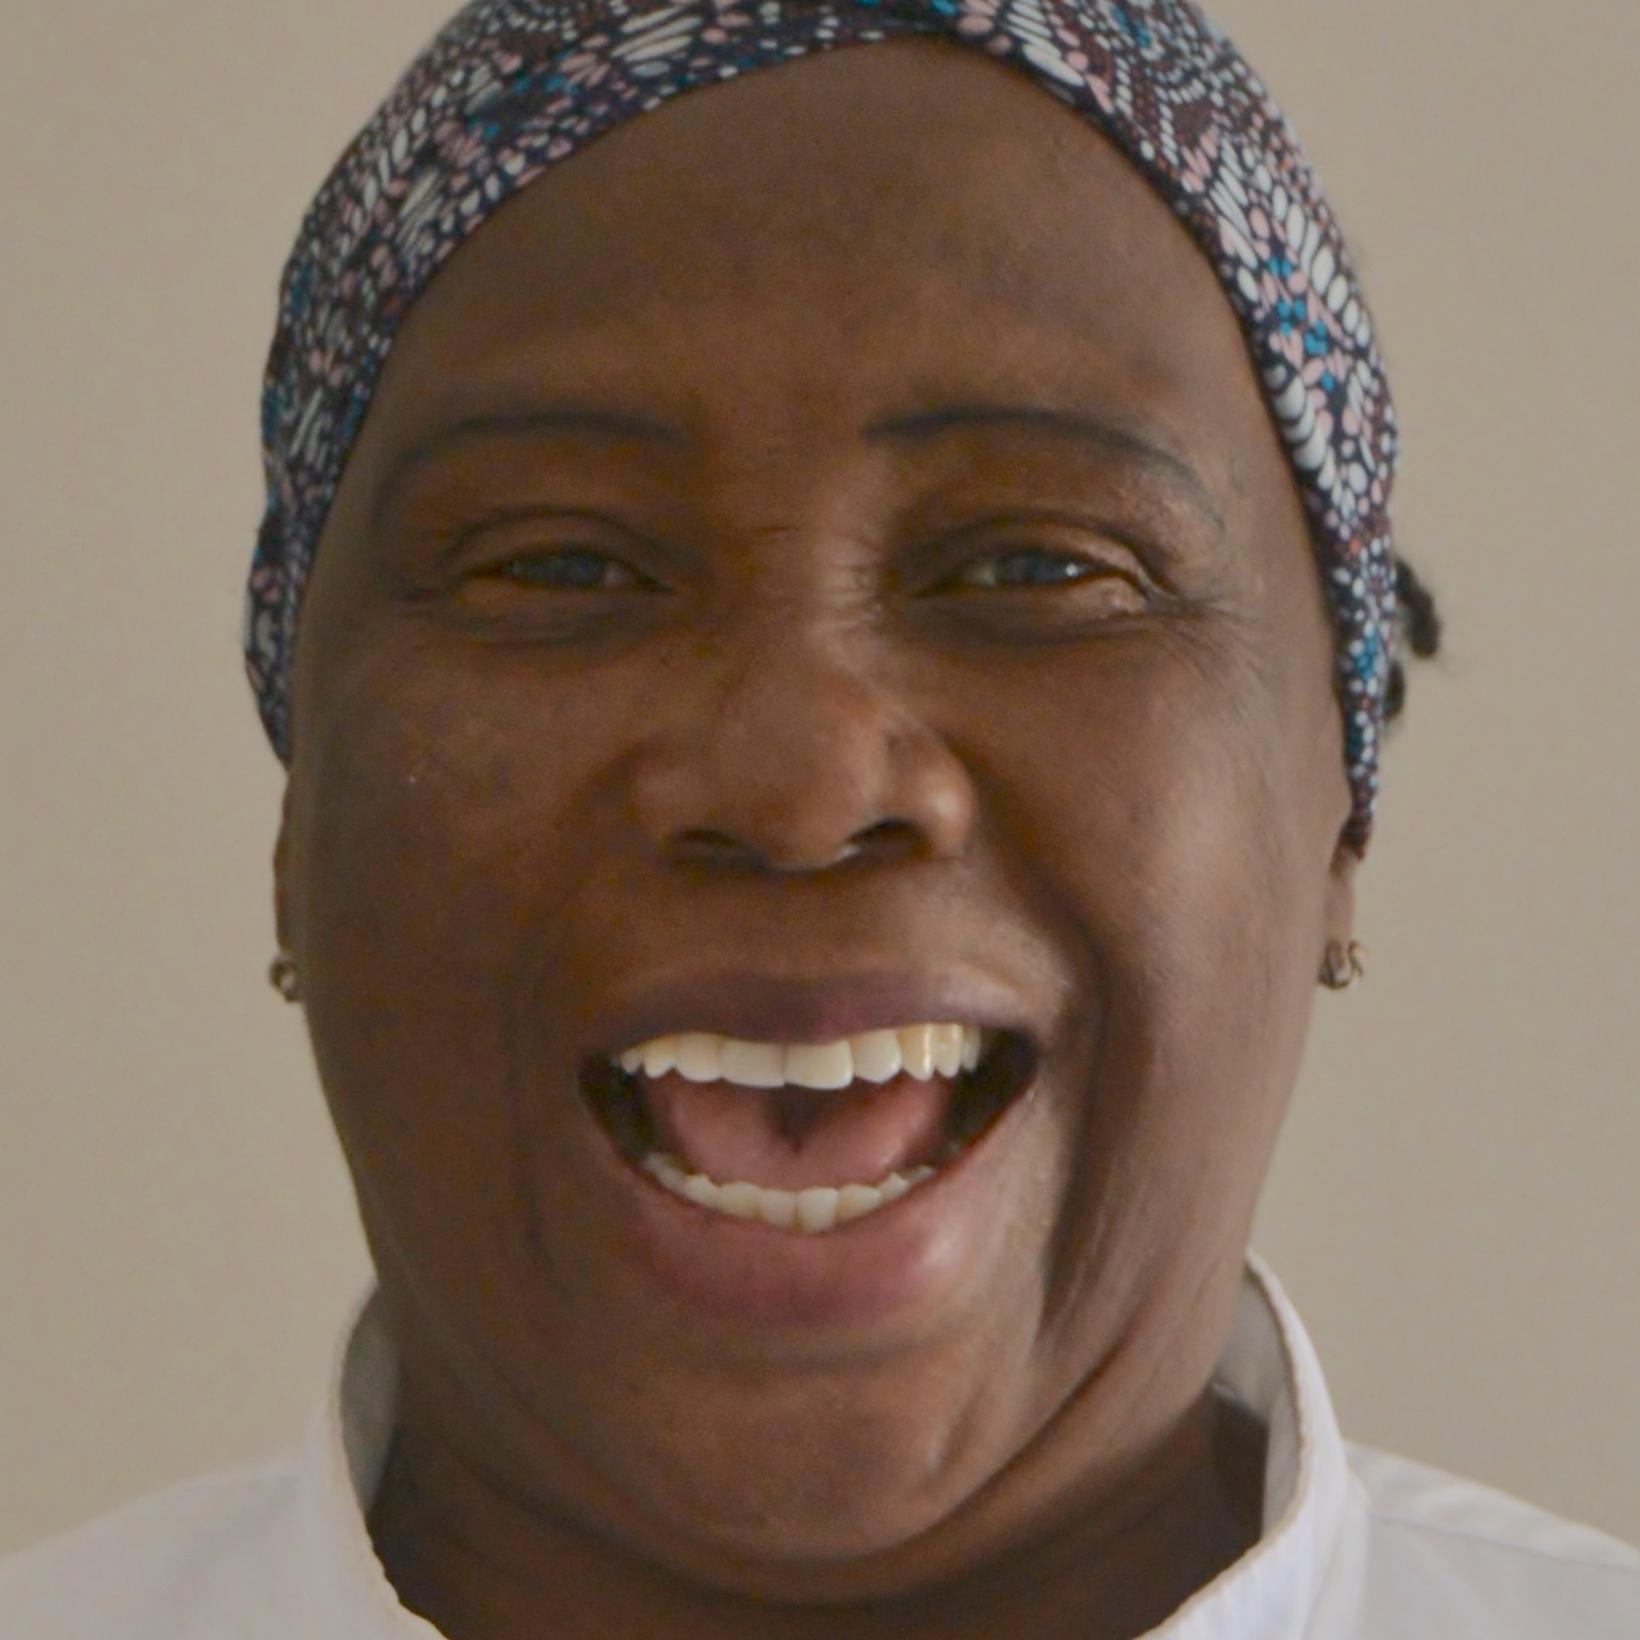 Stephalina_Letswele_chef_Muluwa